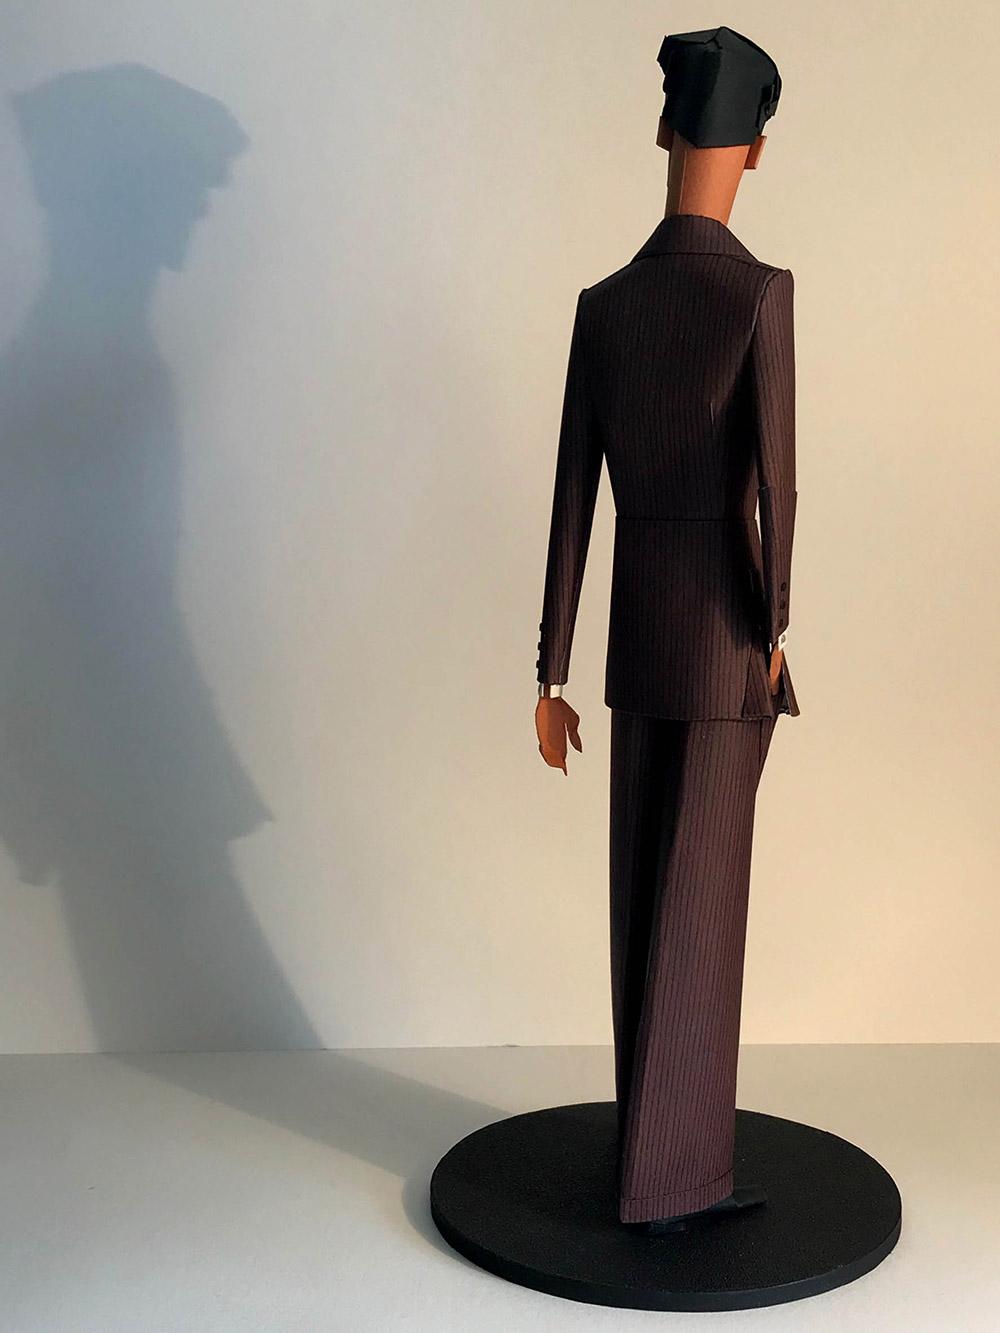 2-saint-aubin-Elegant-au-costume-bordeaux-c-galerie-bettina-art-contemporain-paris